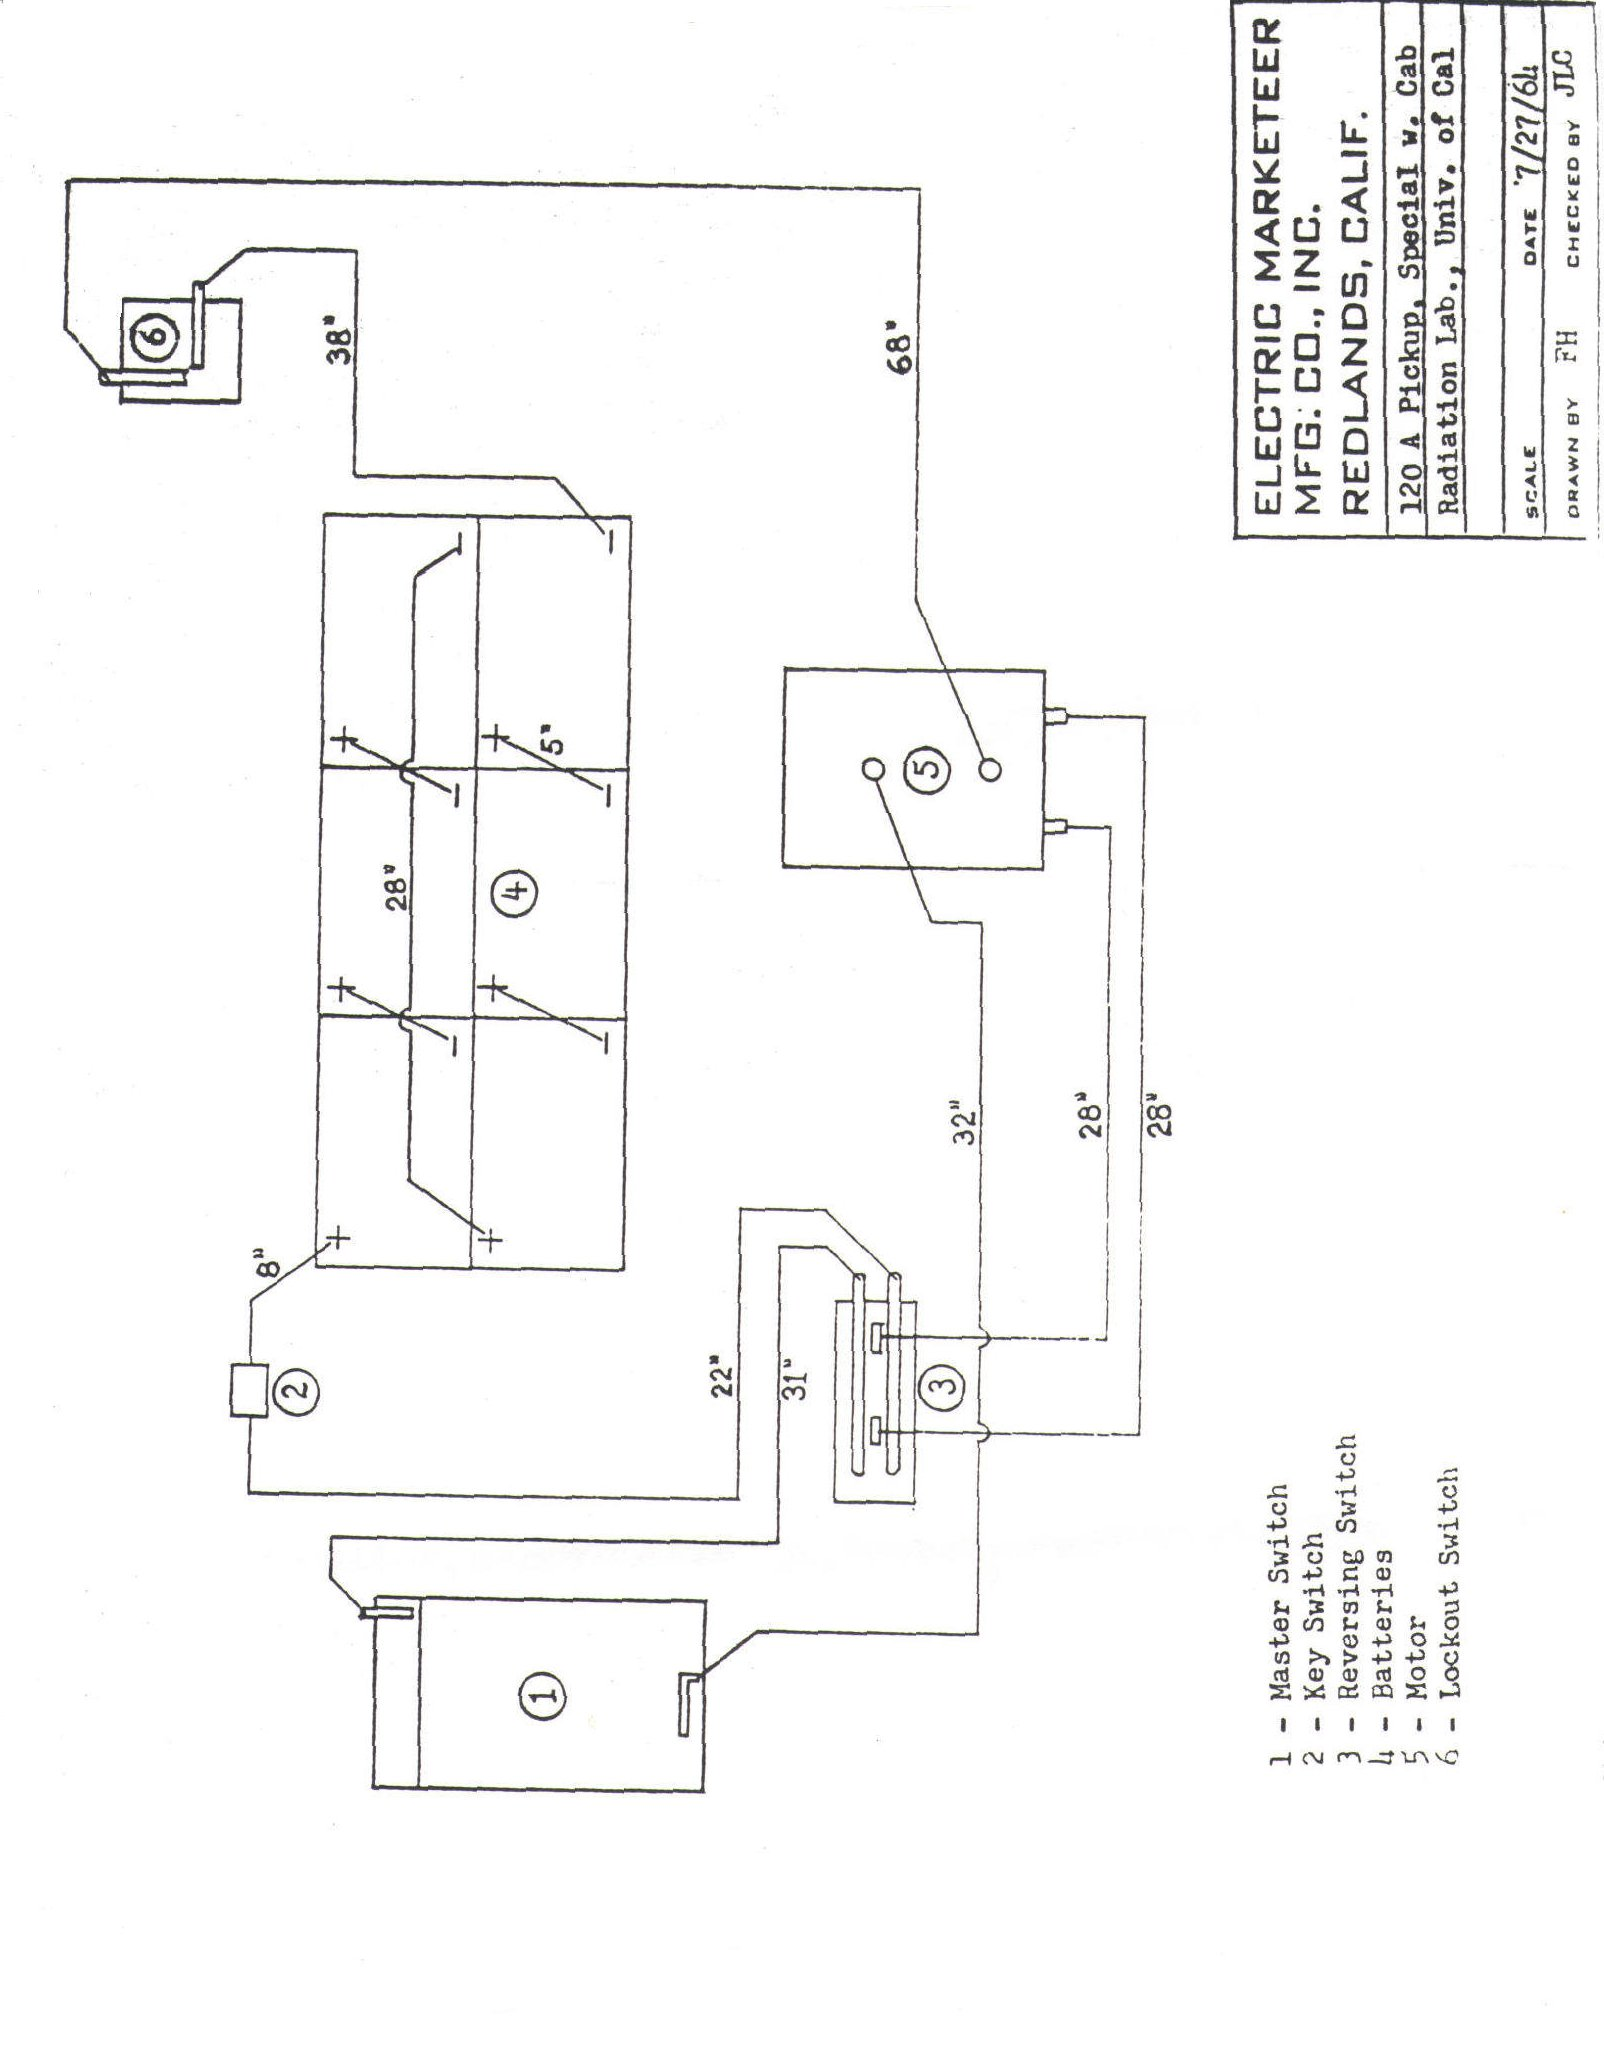 westinghouse golf cart wiring diagram on vintage wiring parts